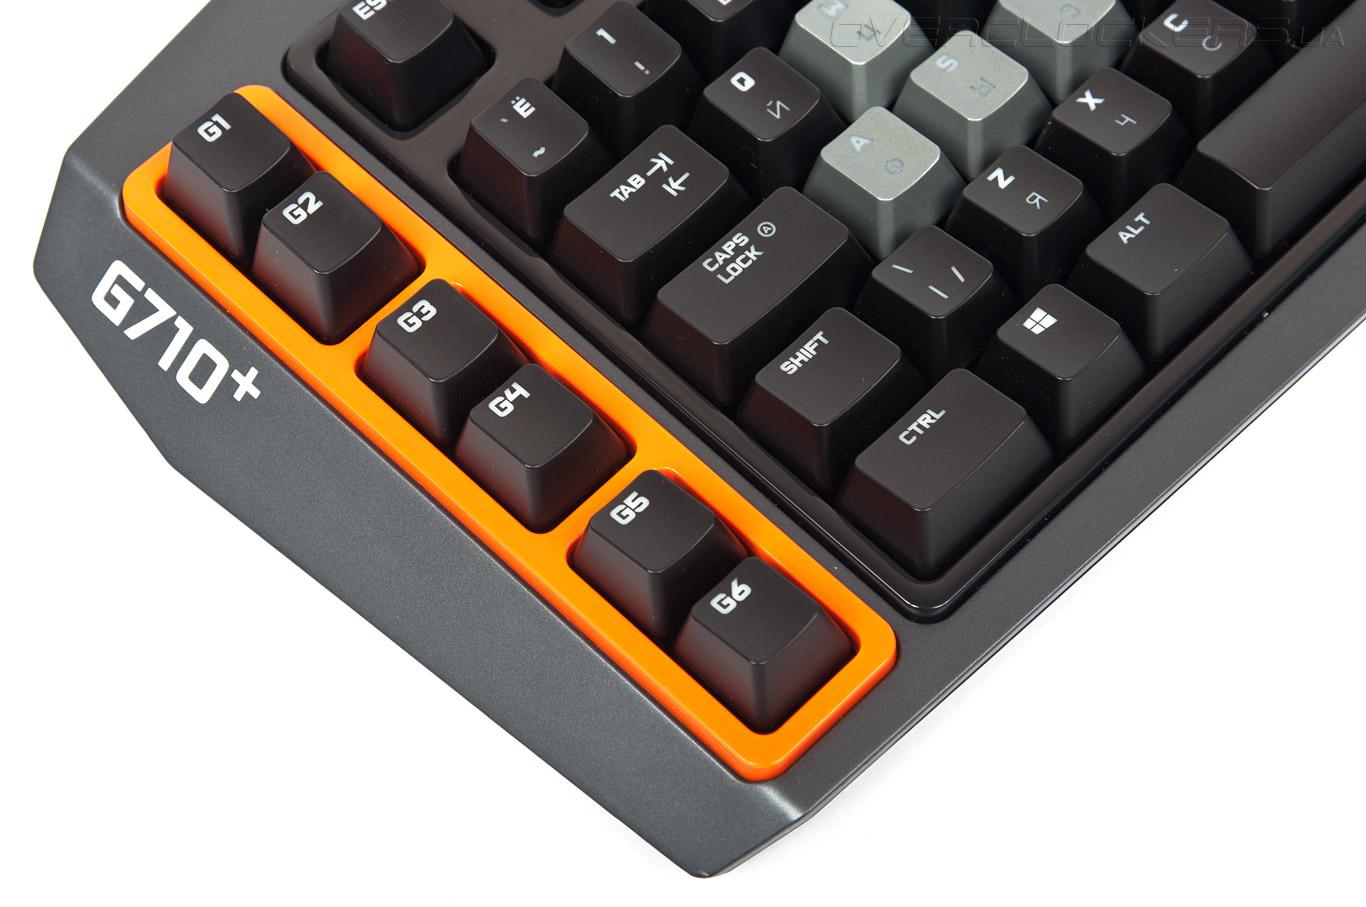 Обзор геймерской клавиатуры Logitech G710+ / Overclockers ua